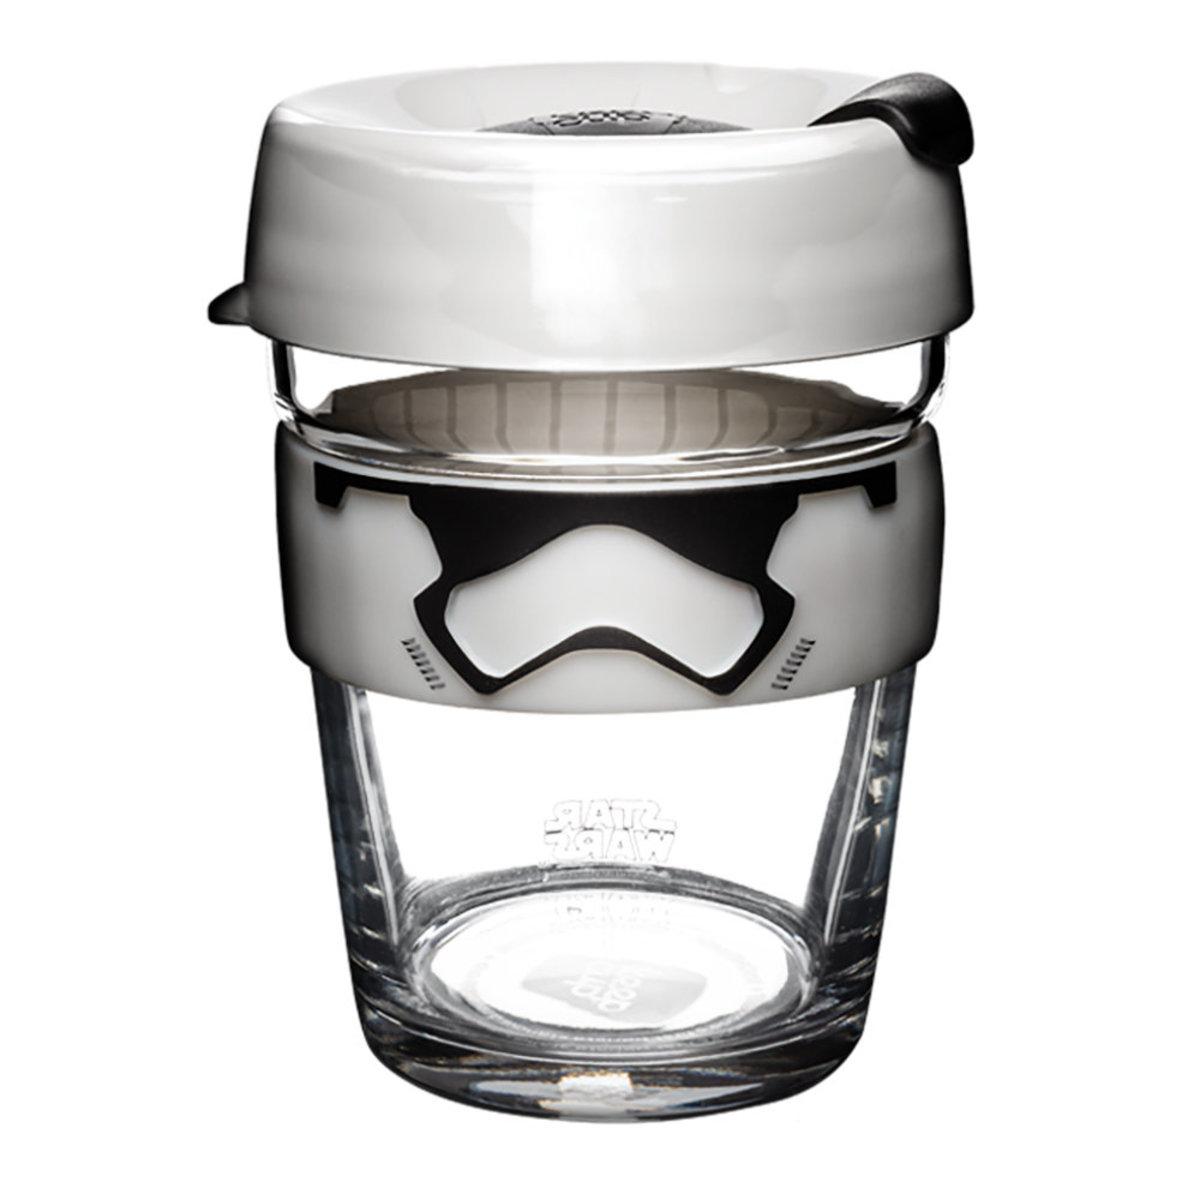 Brew Tempered Glass Cup Medium 12oz/340ml - Star Wars Stormtrooper